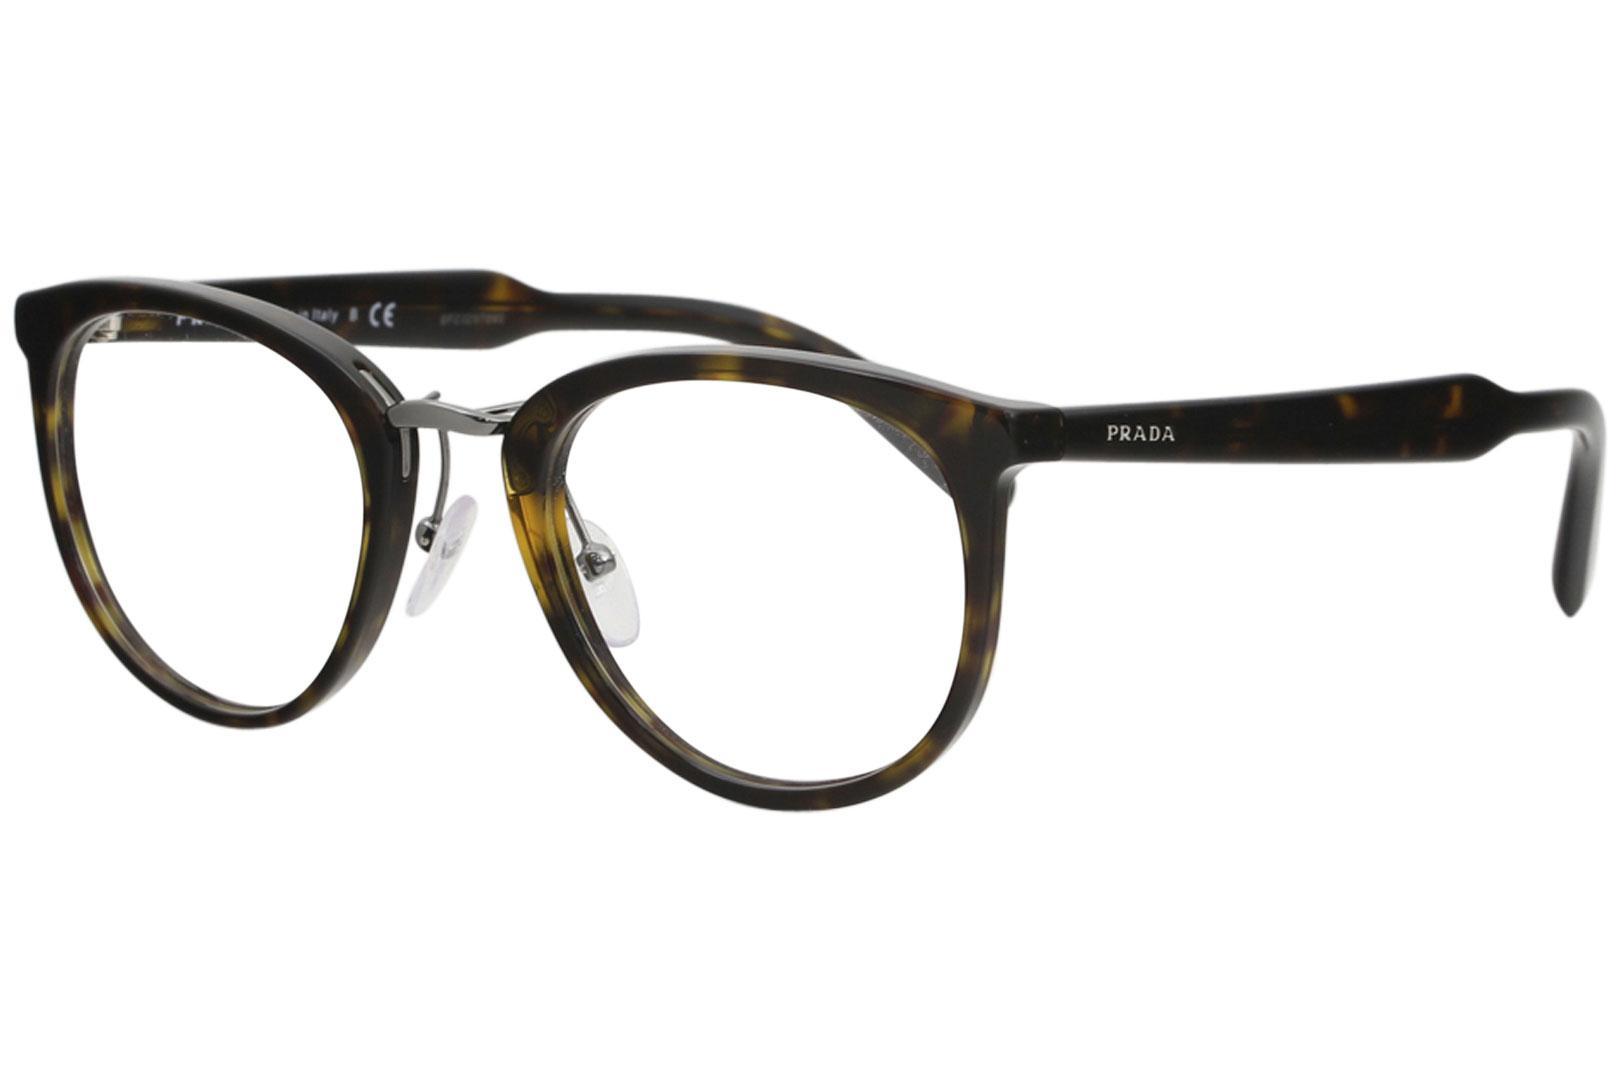 a2c658c5cc9 Prada Men s Eyeglasses VPR03T VPR 03T Full Rim Optical Frame by Prada